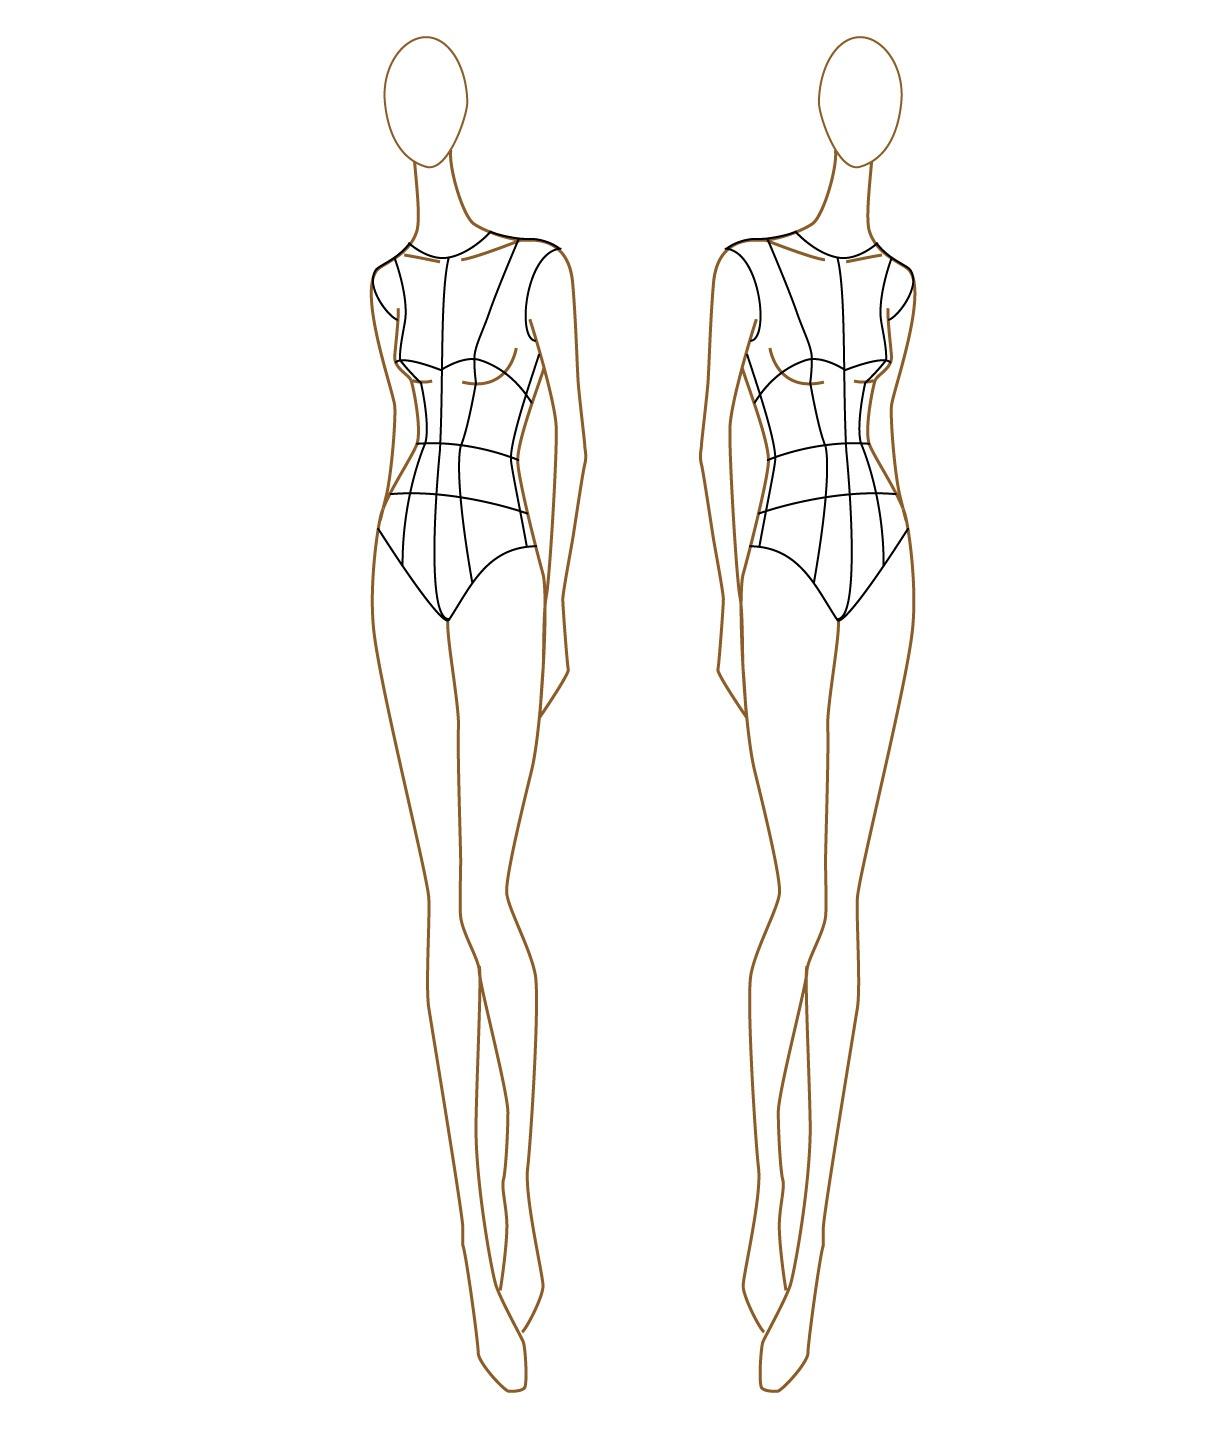 Fashion Templates - 33+ Free Designs, Inspiration, Jpg, Format - Free Printable Fashion Templates